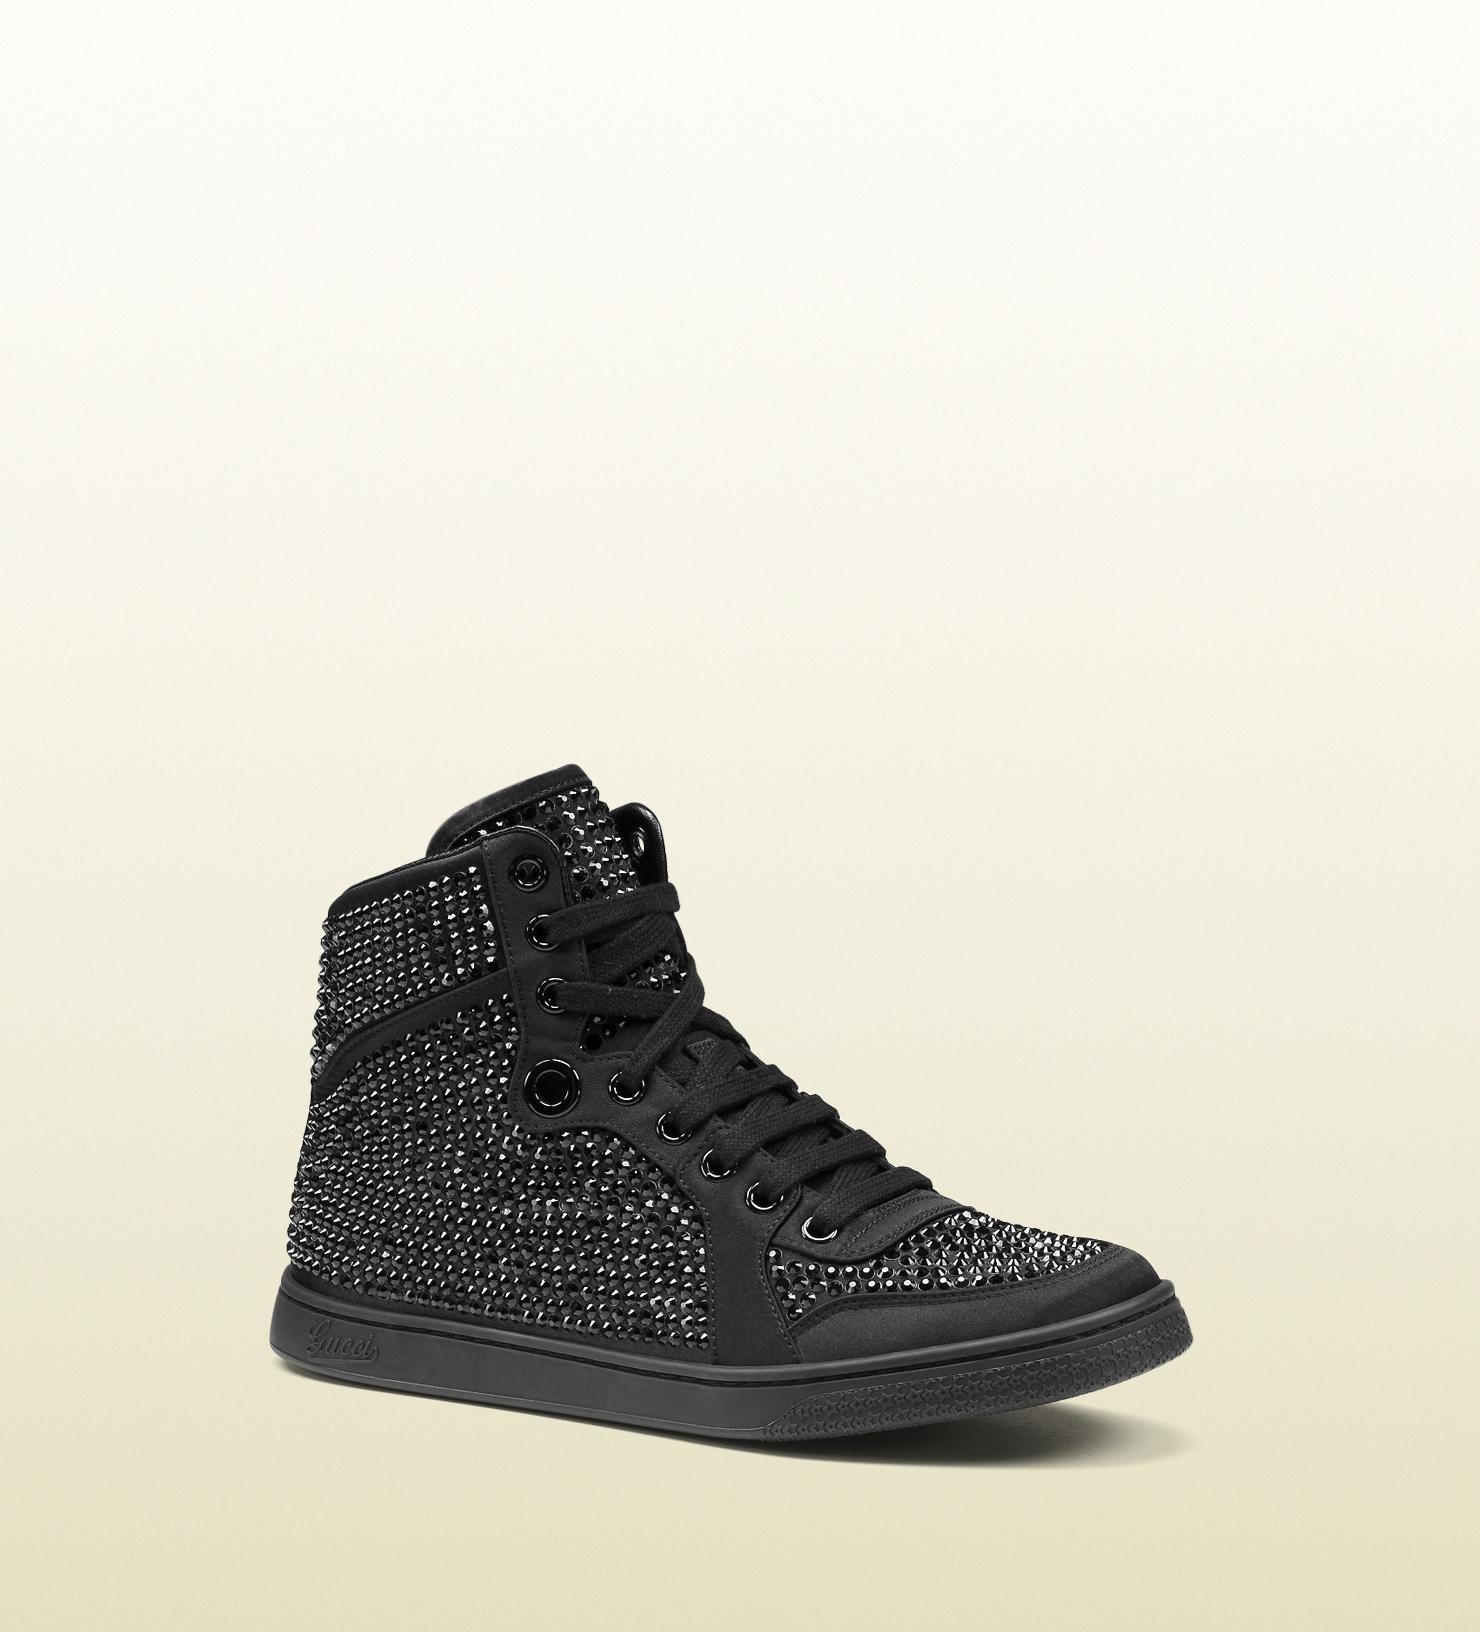 Lyst - Gucci Coda Satin Effect Fabric High-top Sneaker in Black for Men a4a4b73decf